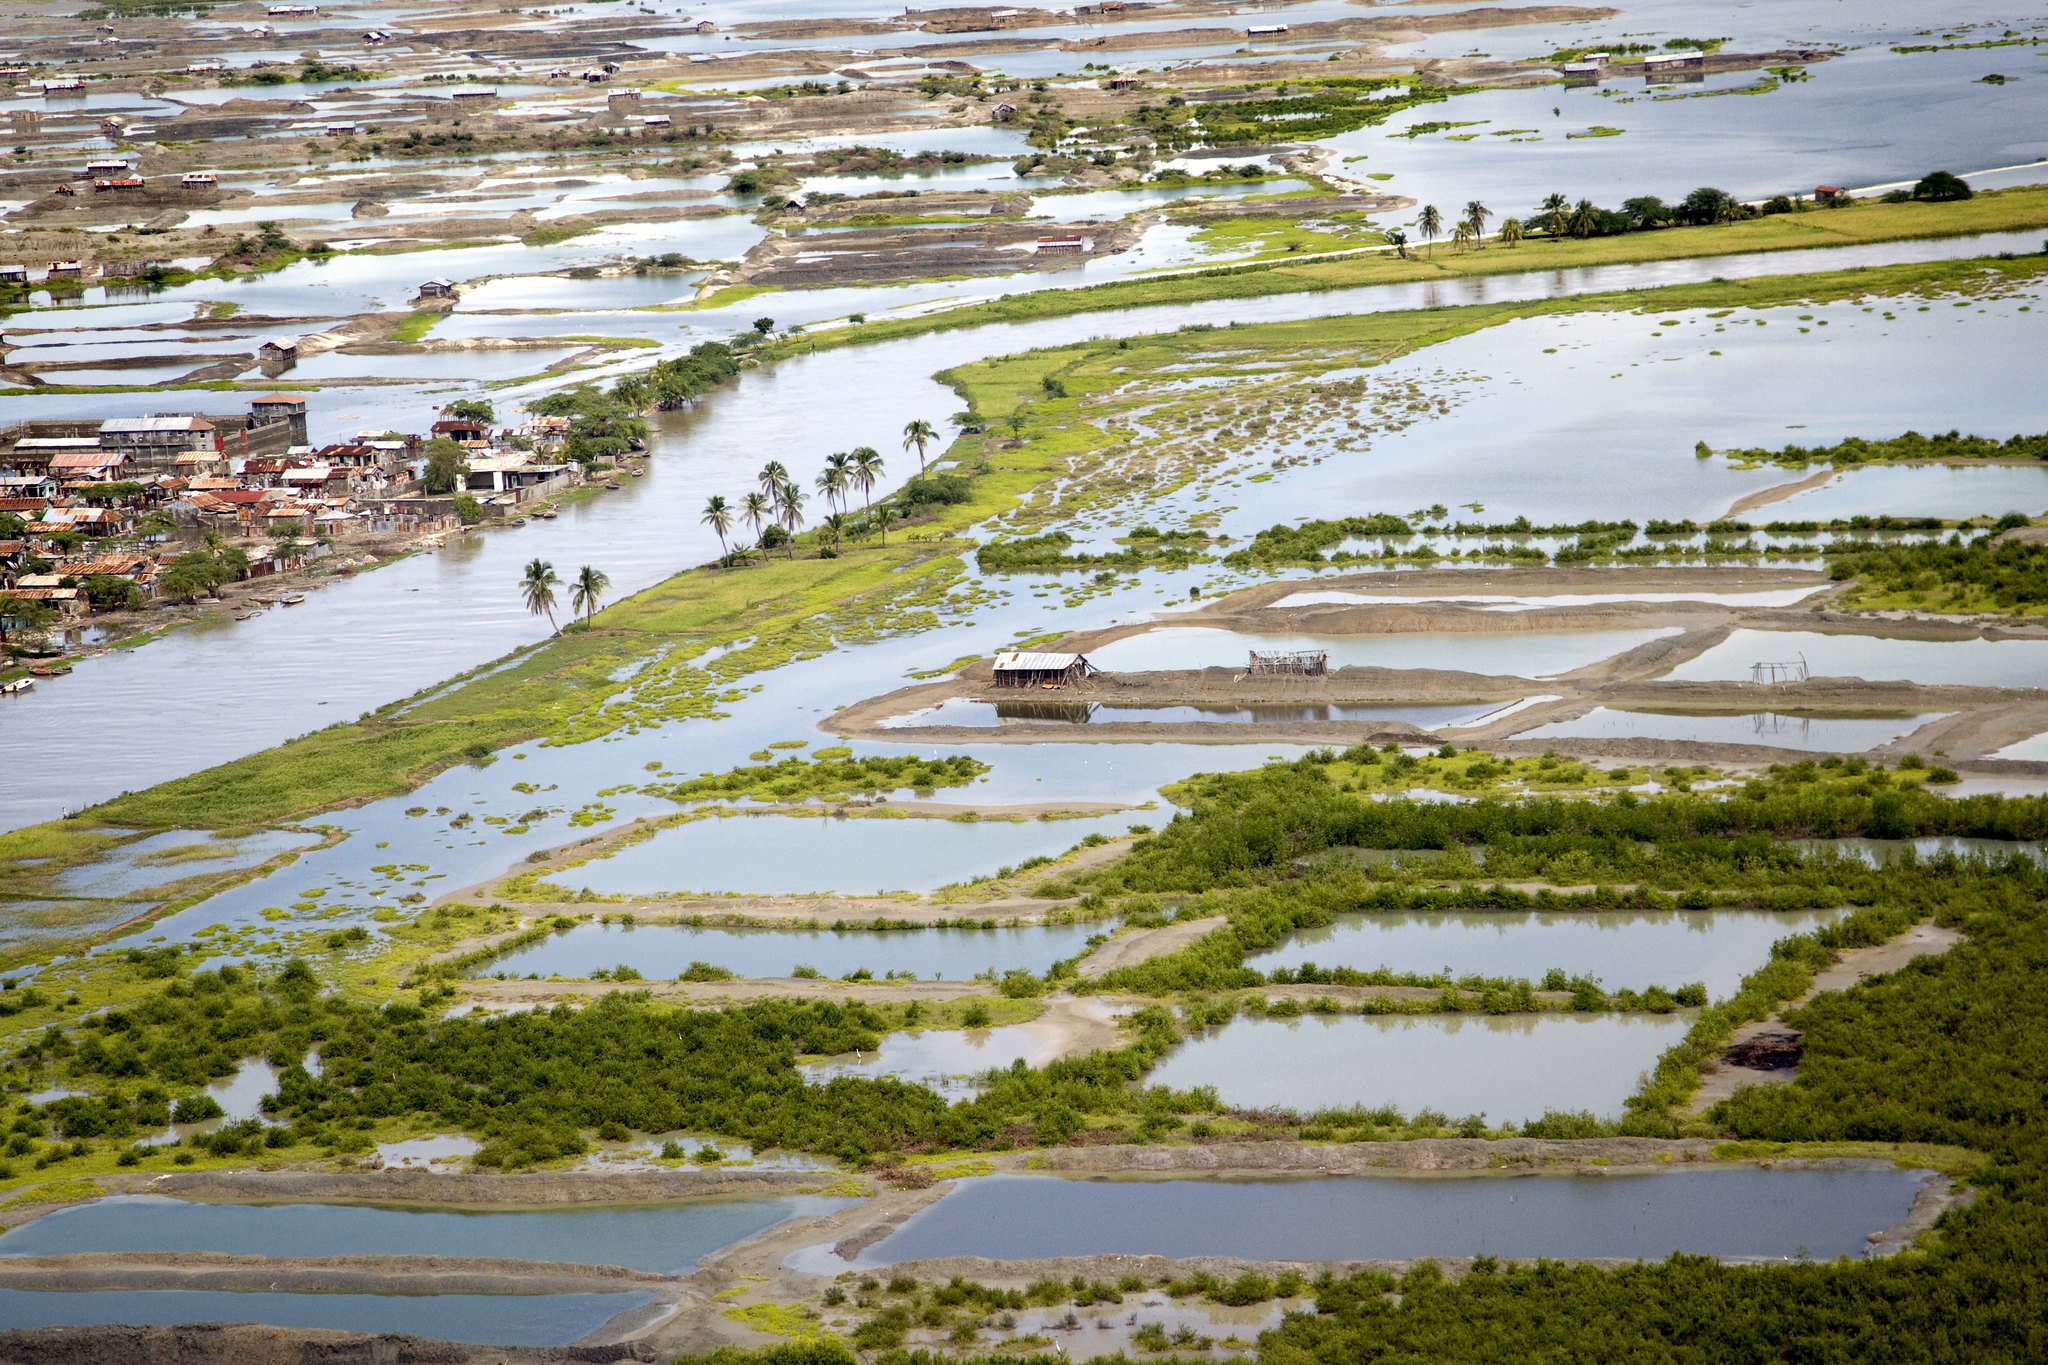 Grande Saline after Hurricane Tomas